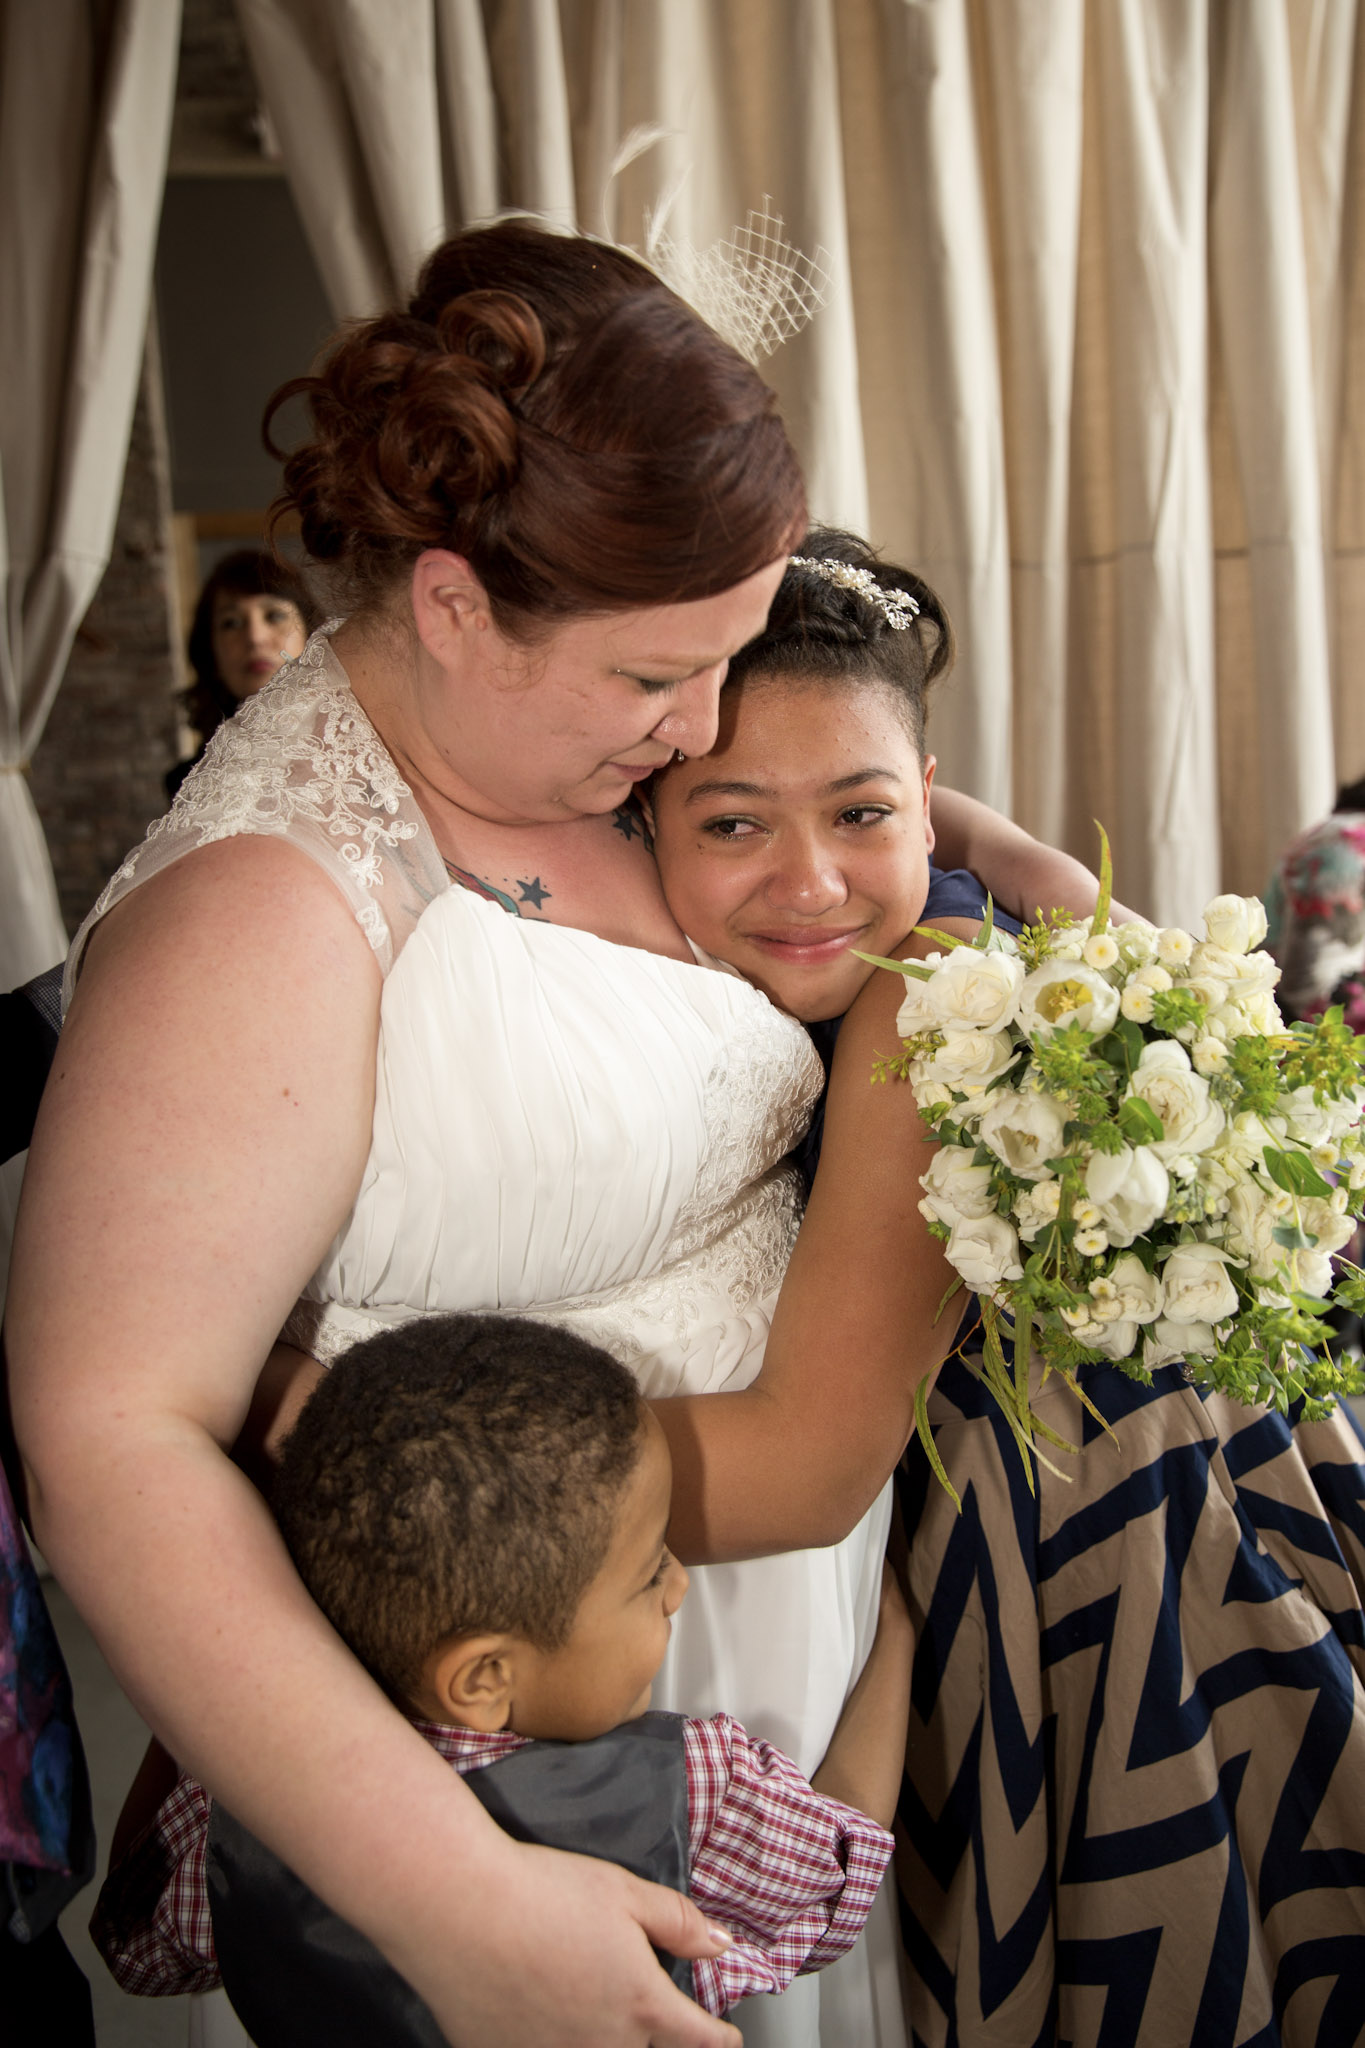 Kansas+City-Small+Wedding-Elope_Intimate_Ceremony_Mother's+Day_8.jpg